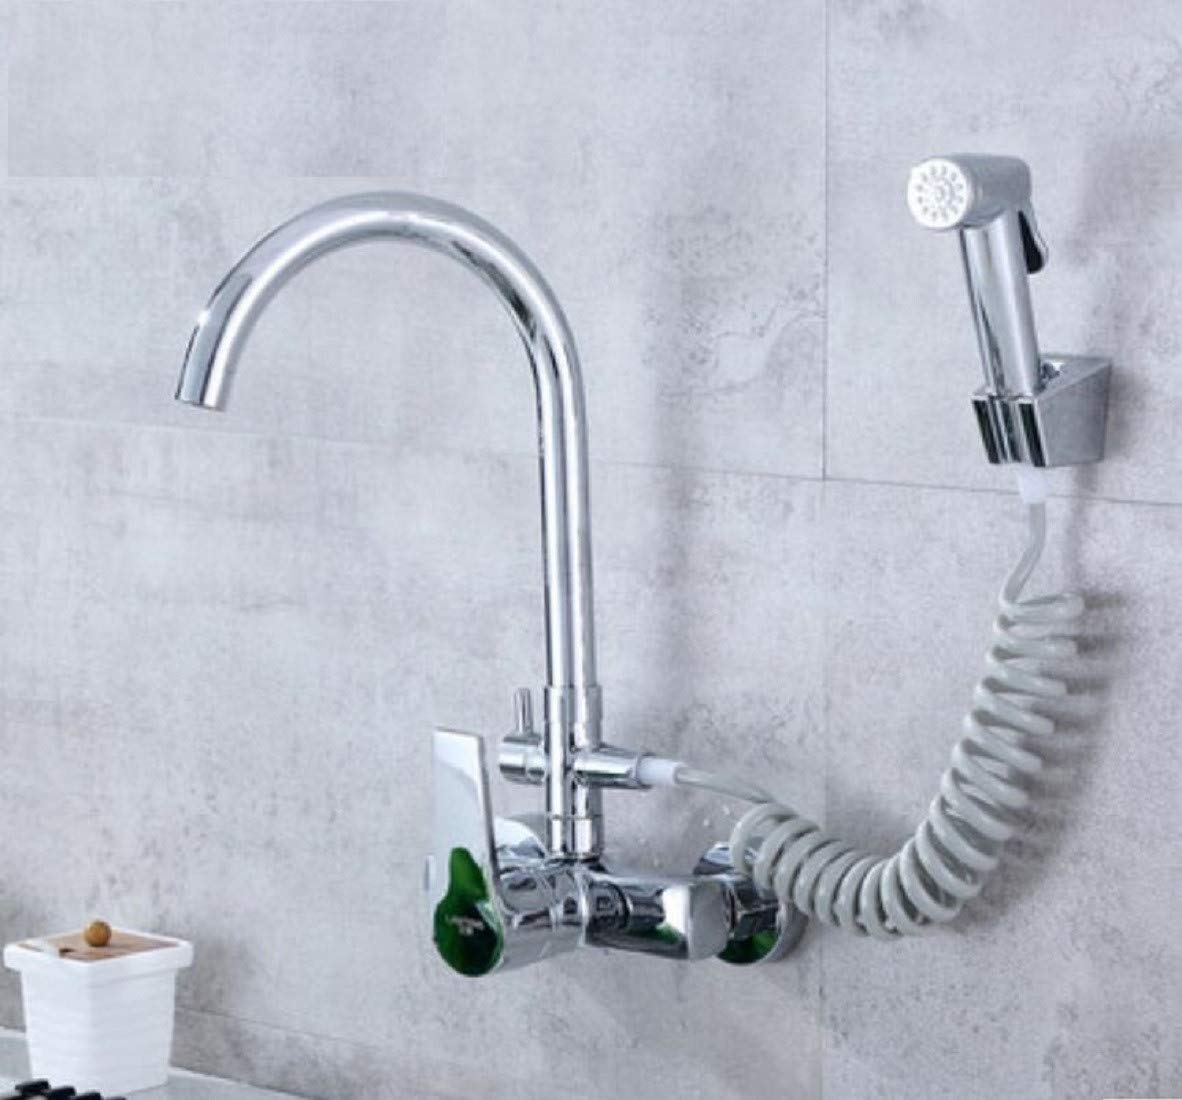 Kitchen Faucet Single Double Hole Into The Wall Type Kitchen Multi-Purpose Spray Gun Laundry Basin Sink Cold And Hot Faucet Kitchen Sink Faucets Basin Mixer Faucet